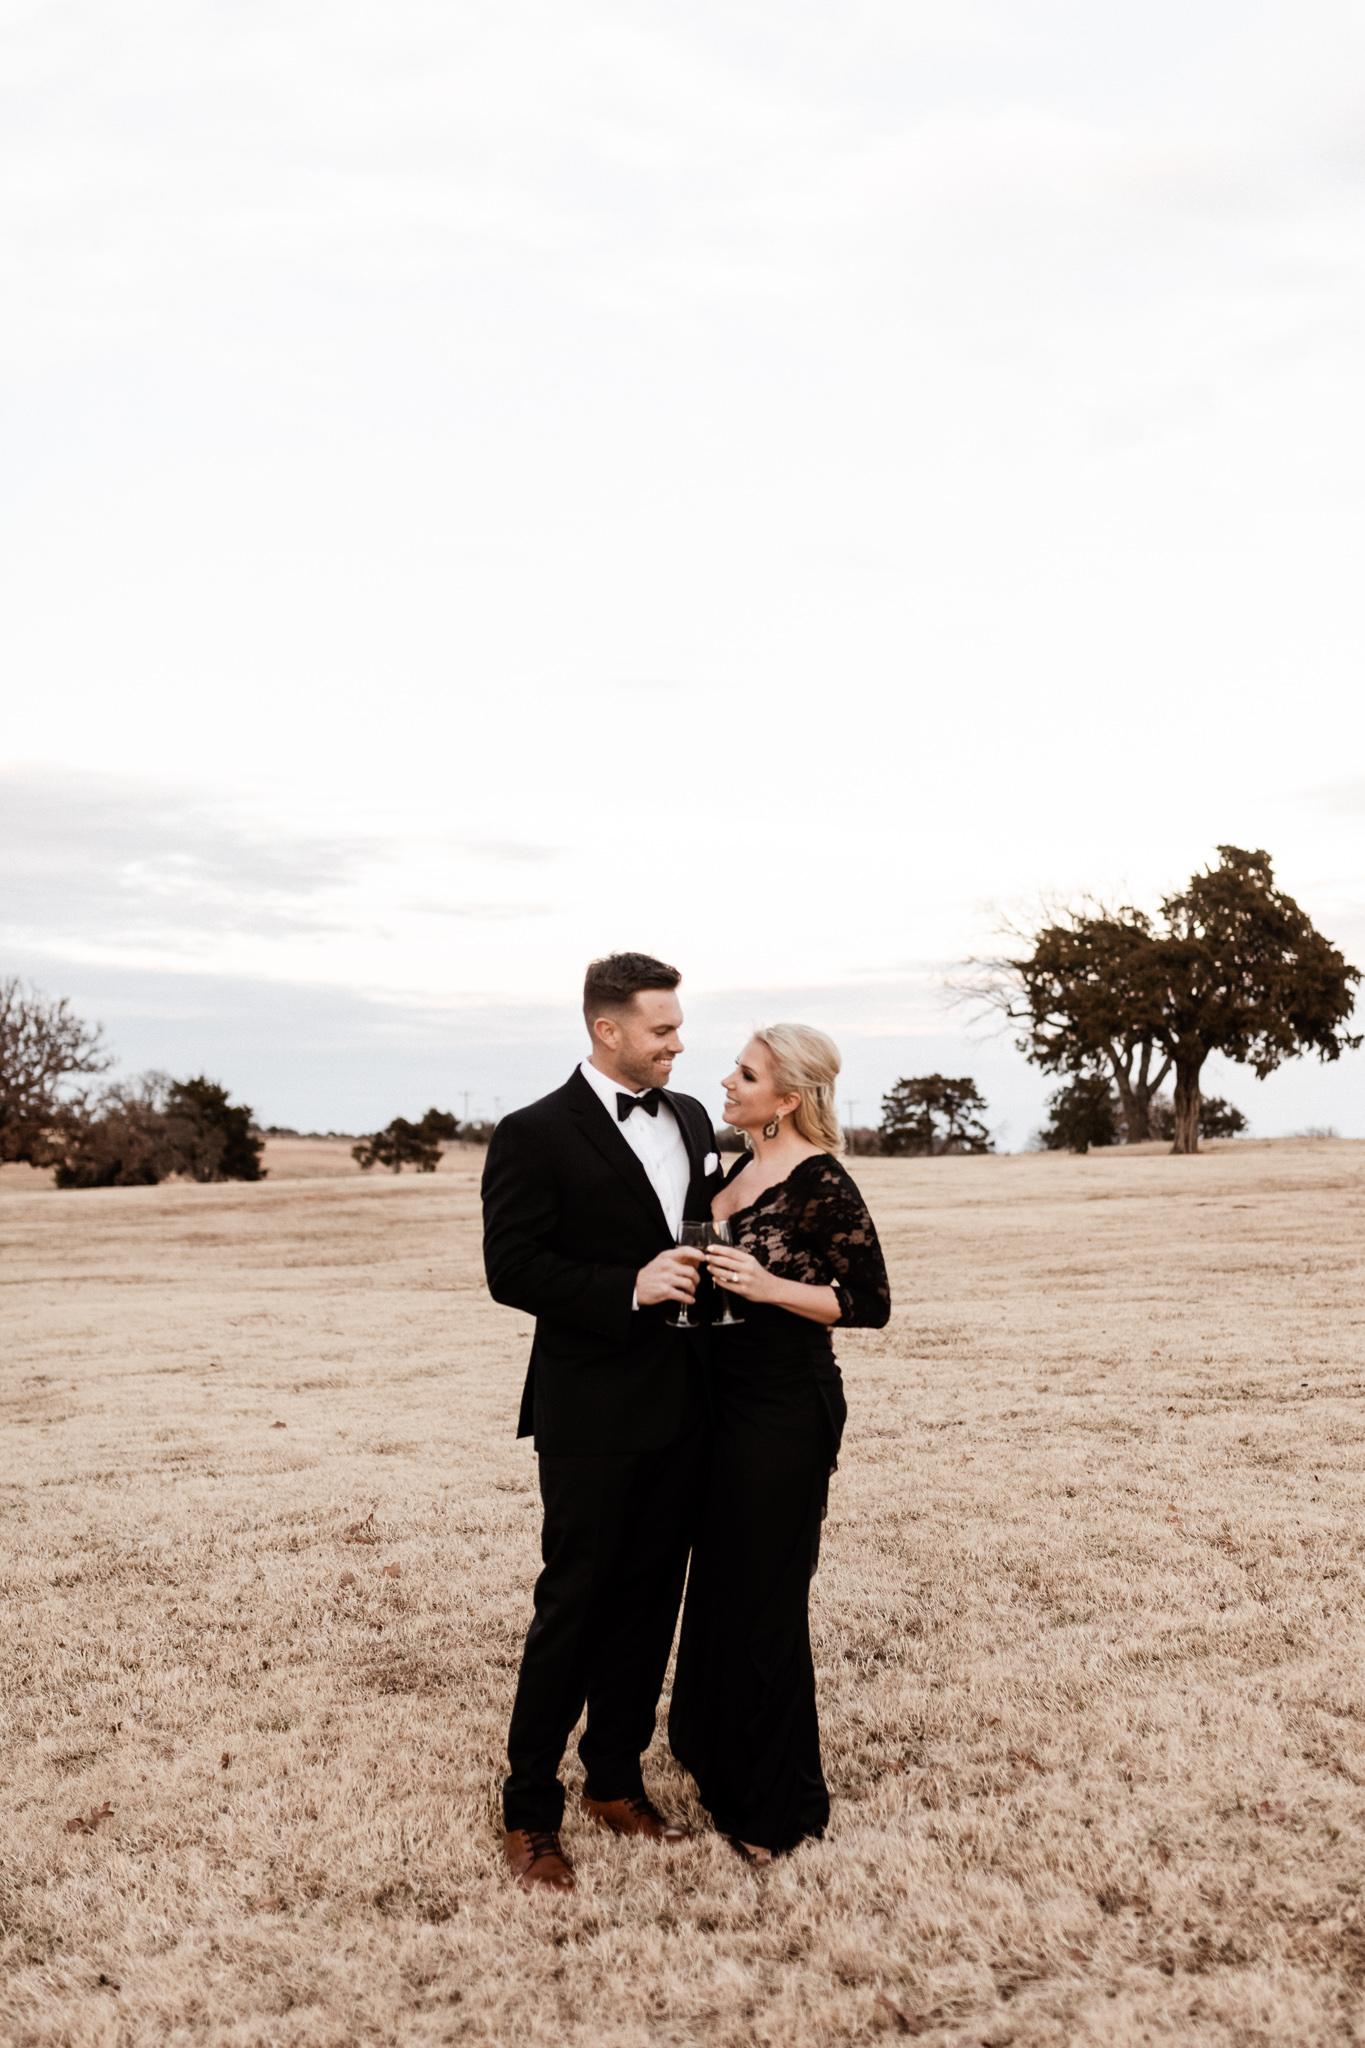 Wade + Stephanie | Warm Open Field Engagements | Oklahoma Wedding Photographer-52.jpg